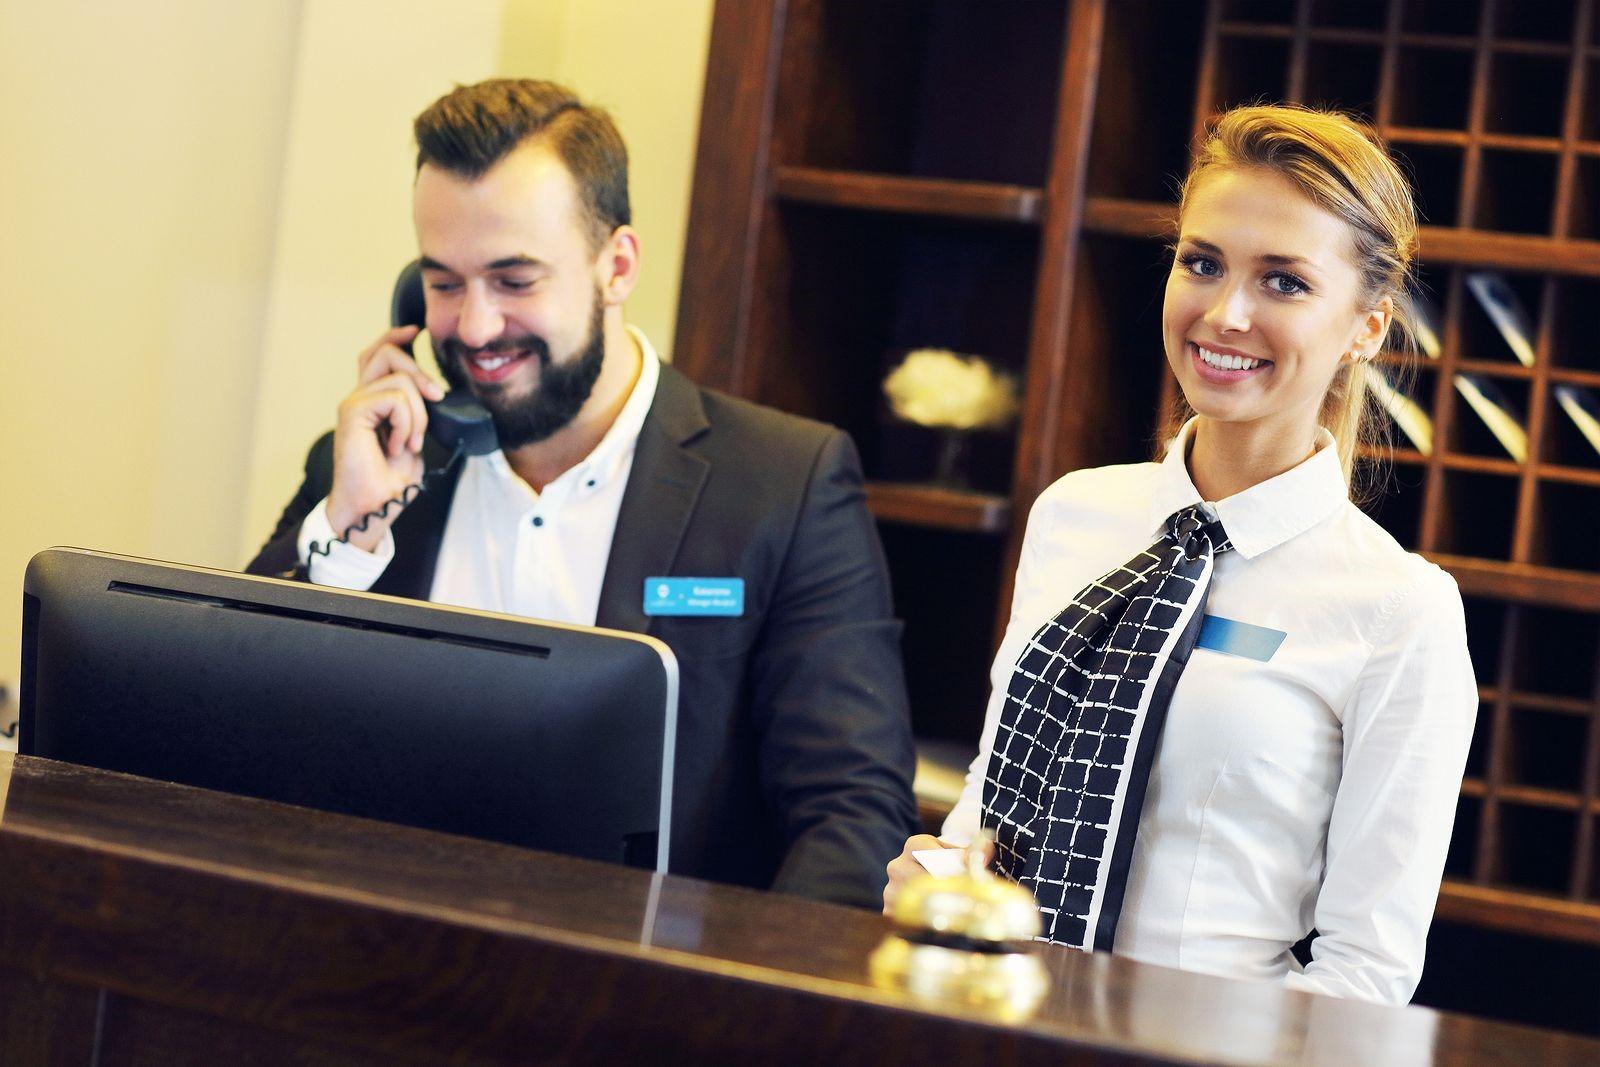 hotel attendant